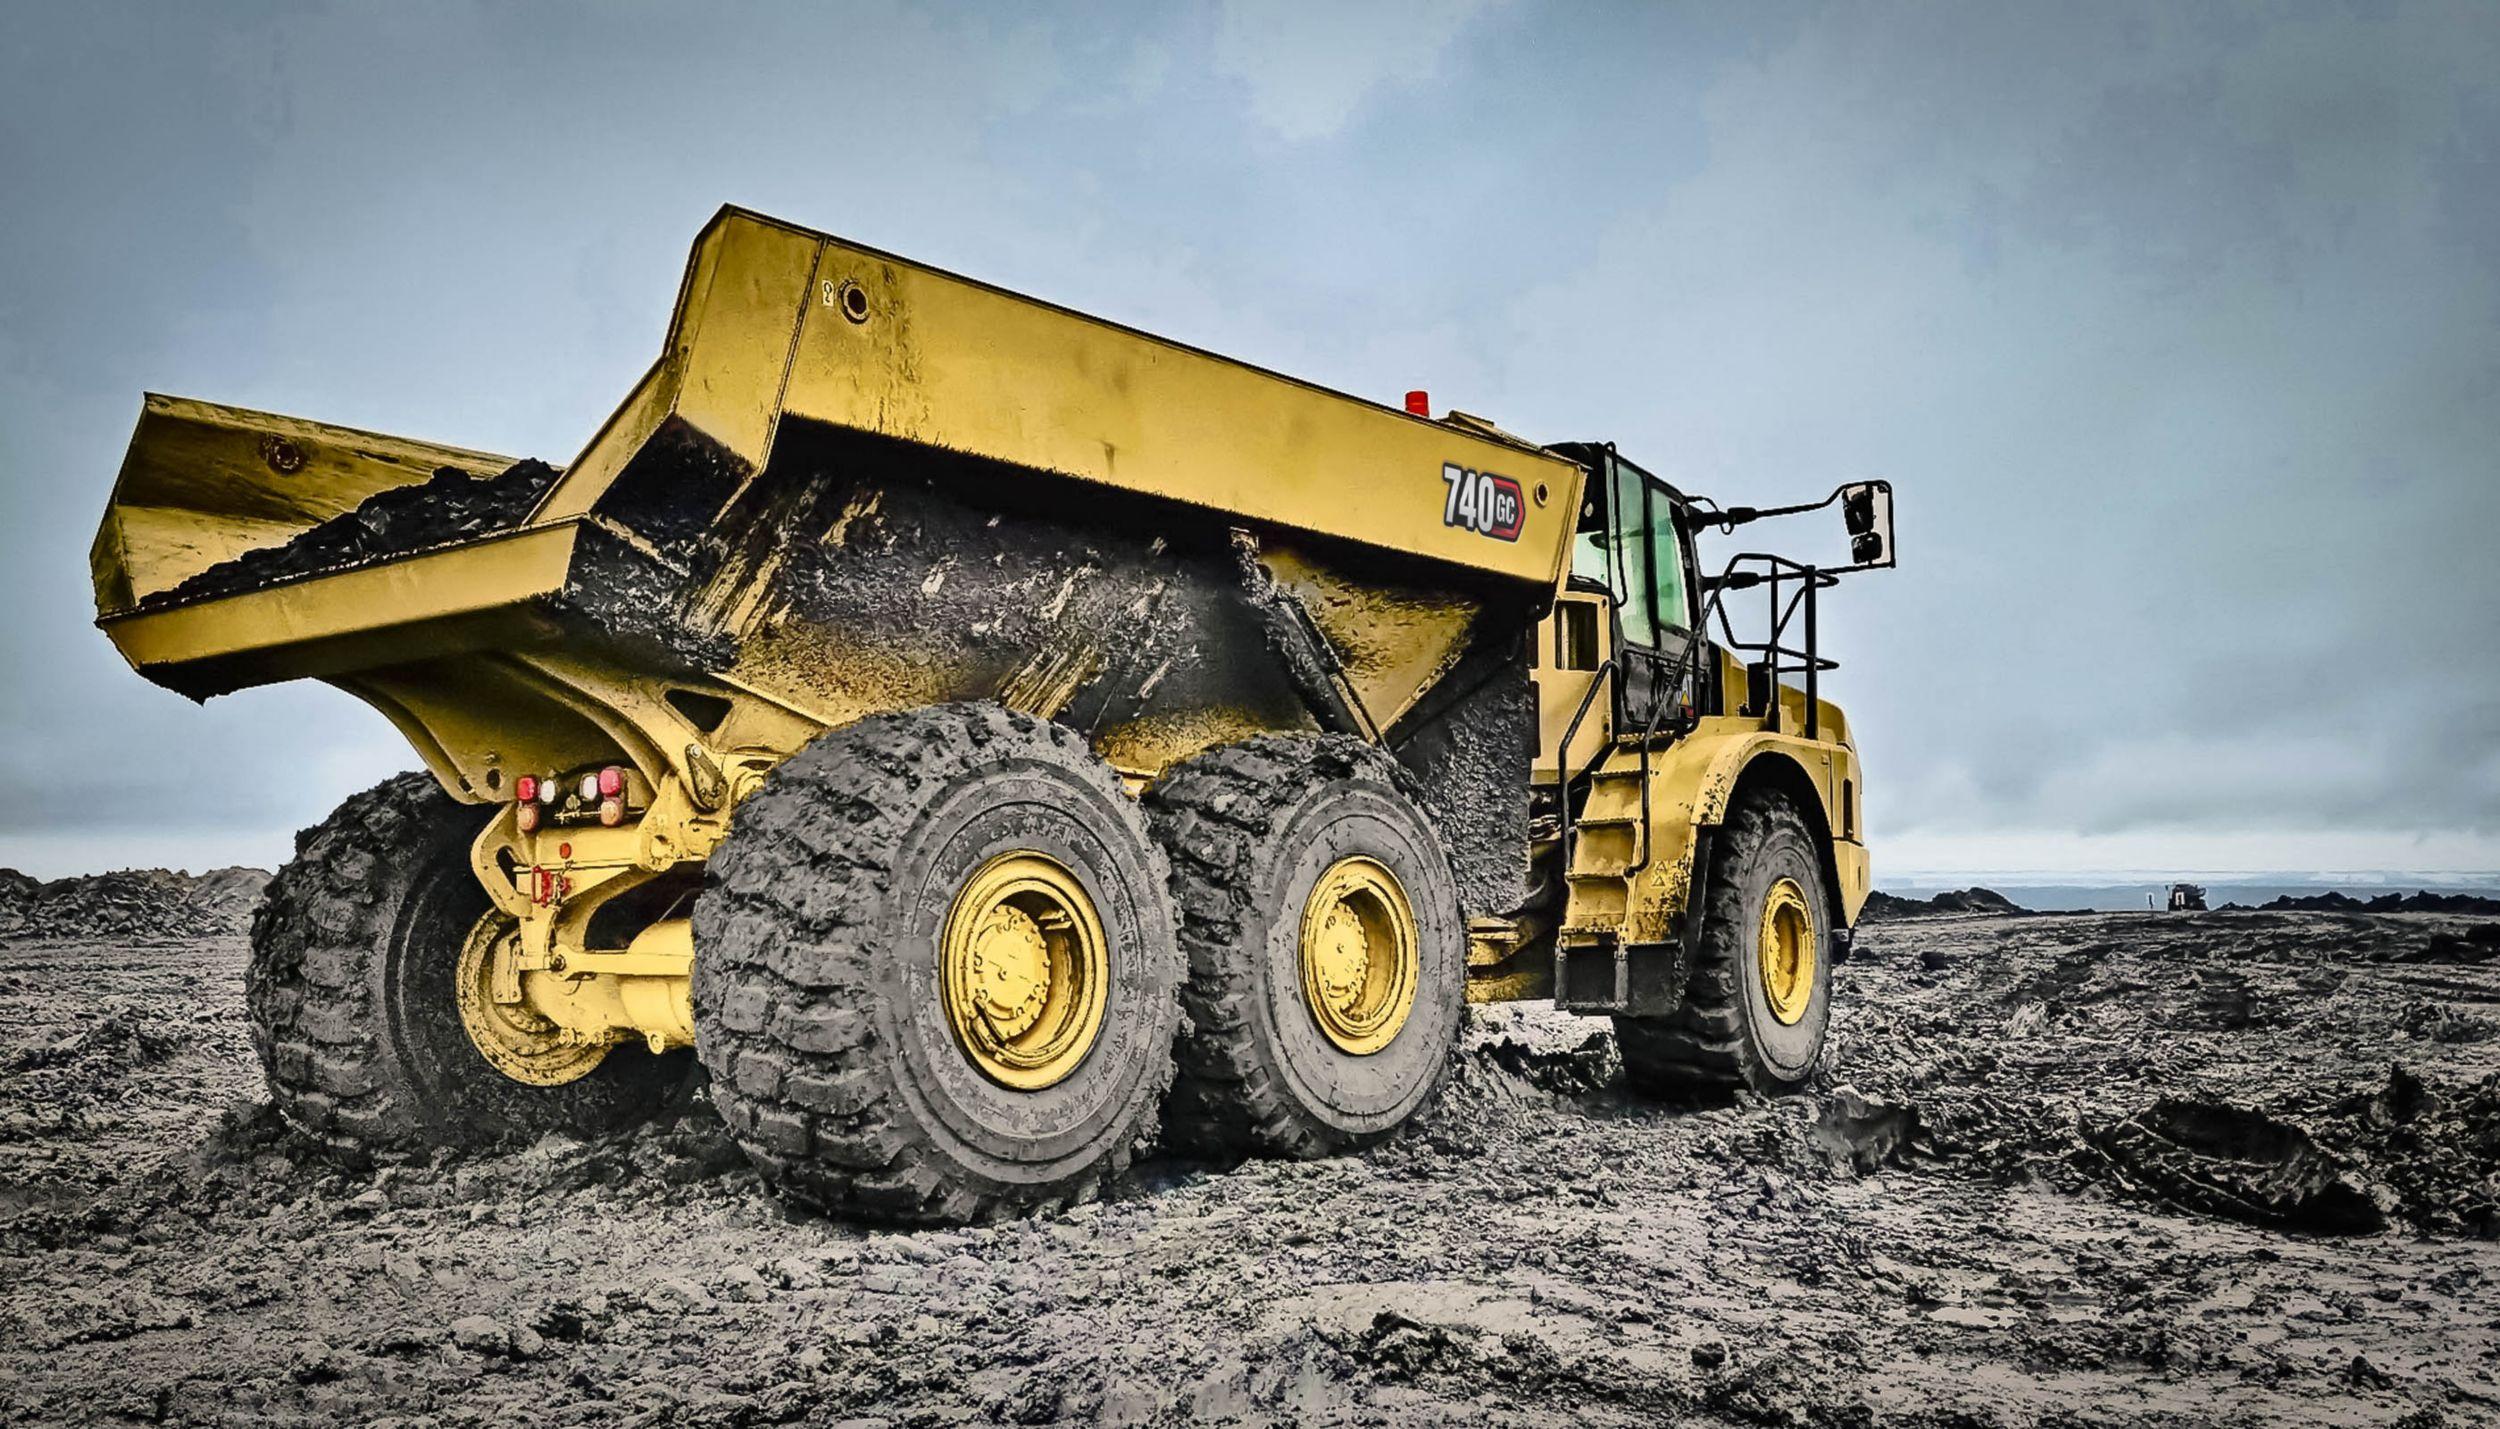 740 GC Articulated Truck